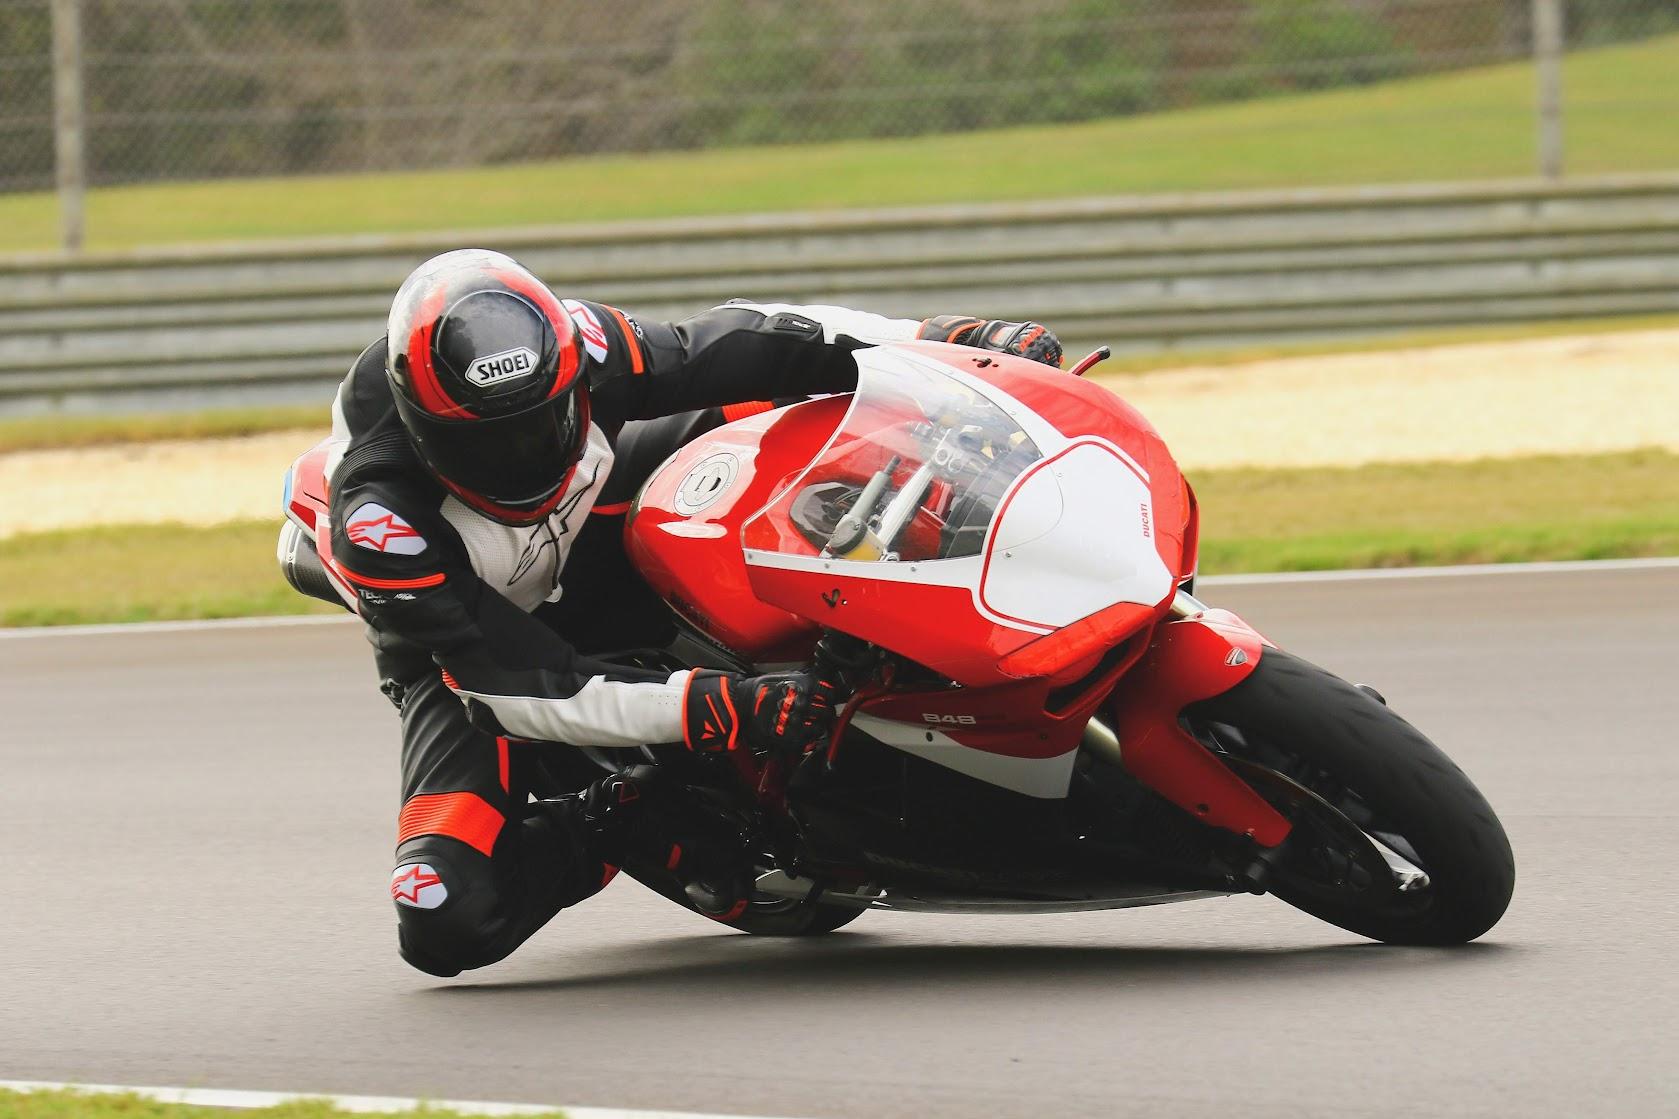 ryan stewart's 2012 Ducati 848 Evo Corse